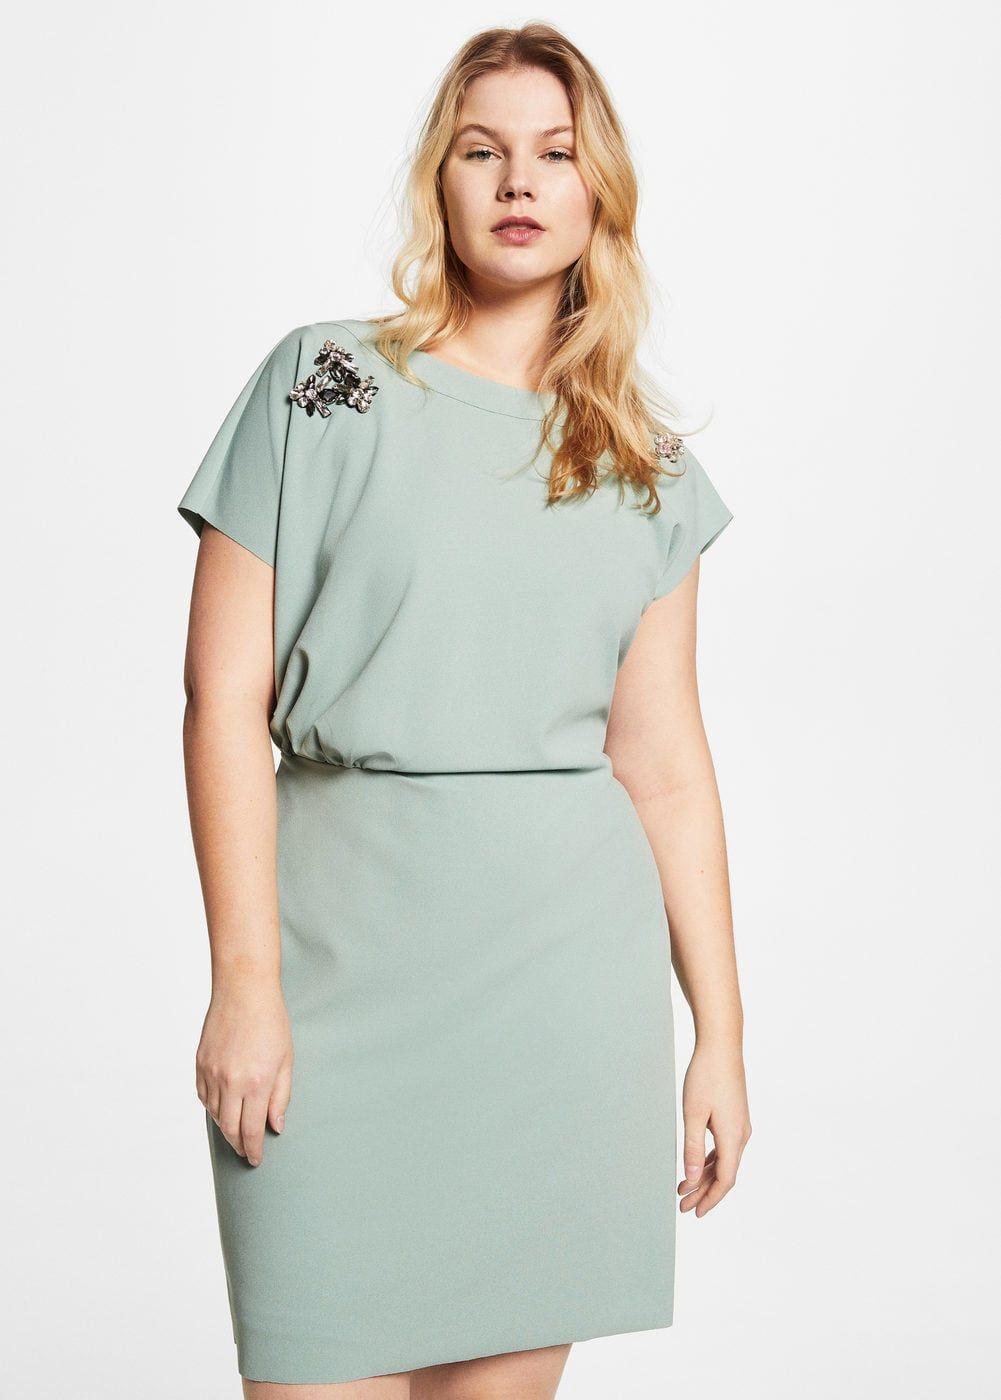 8ff444225846a1 Gedrapeerde jurk met appliqué - Grote maten